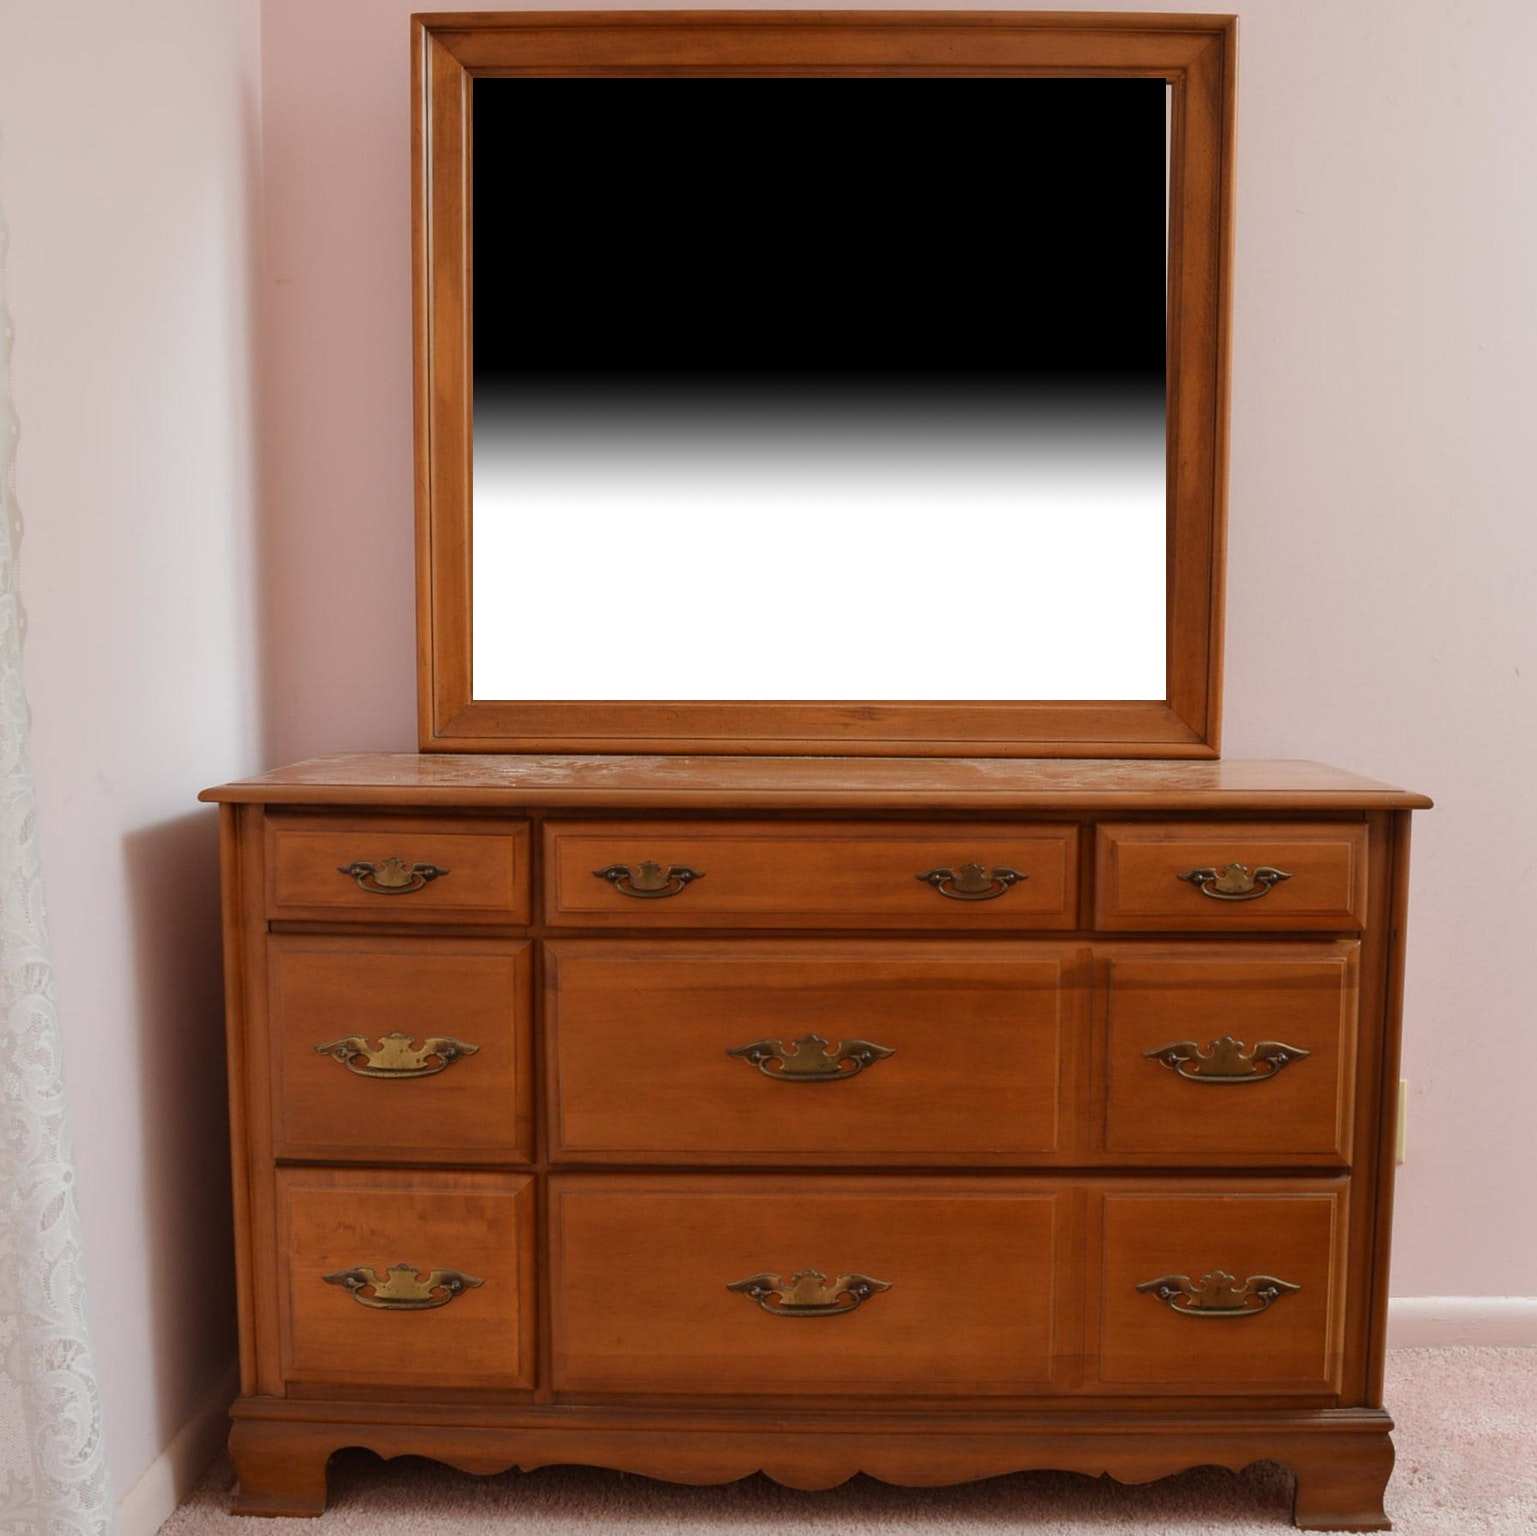 Sumter Cabinet Company Maple Dresser